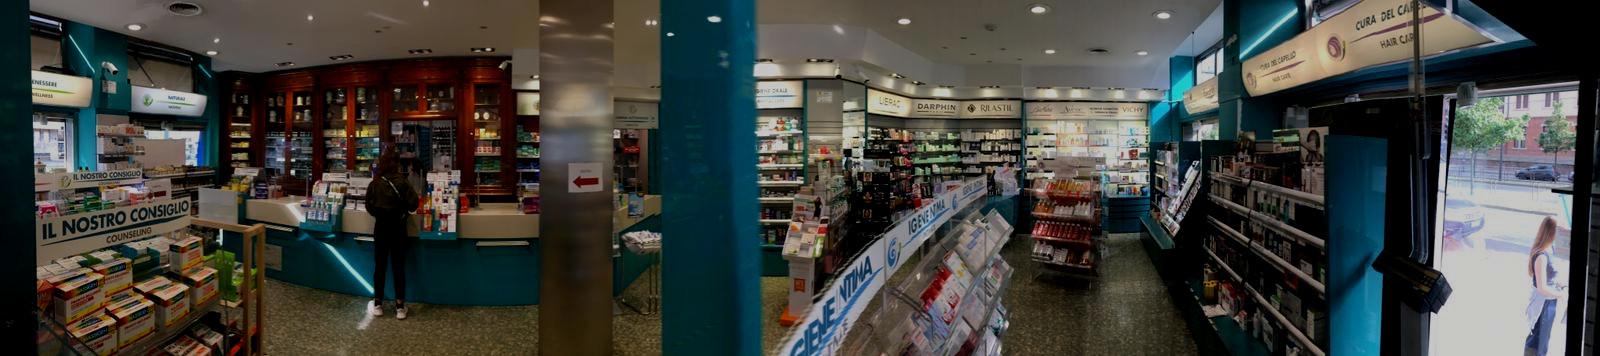 Farmacia Tonale Milano Home